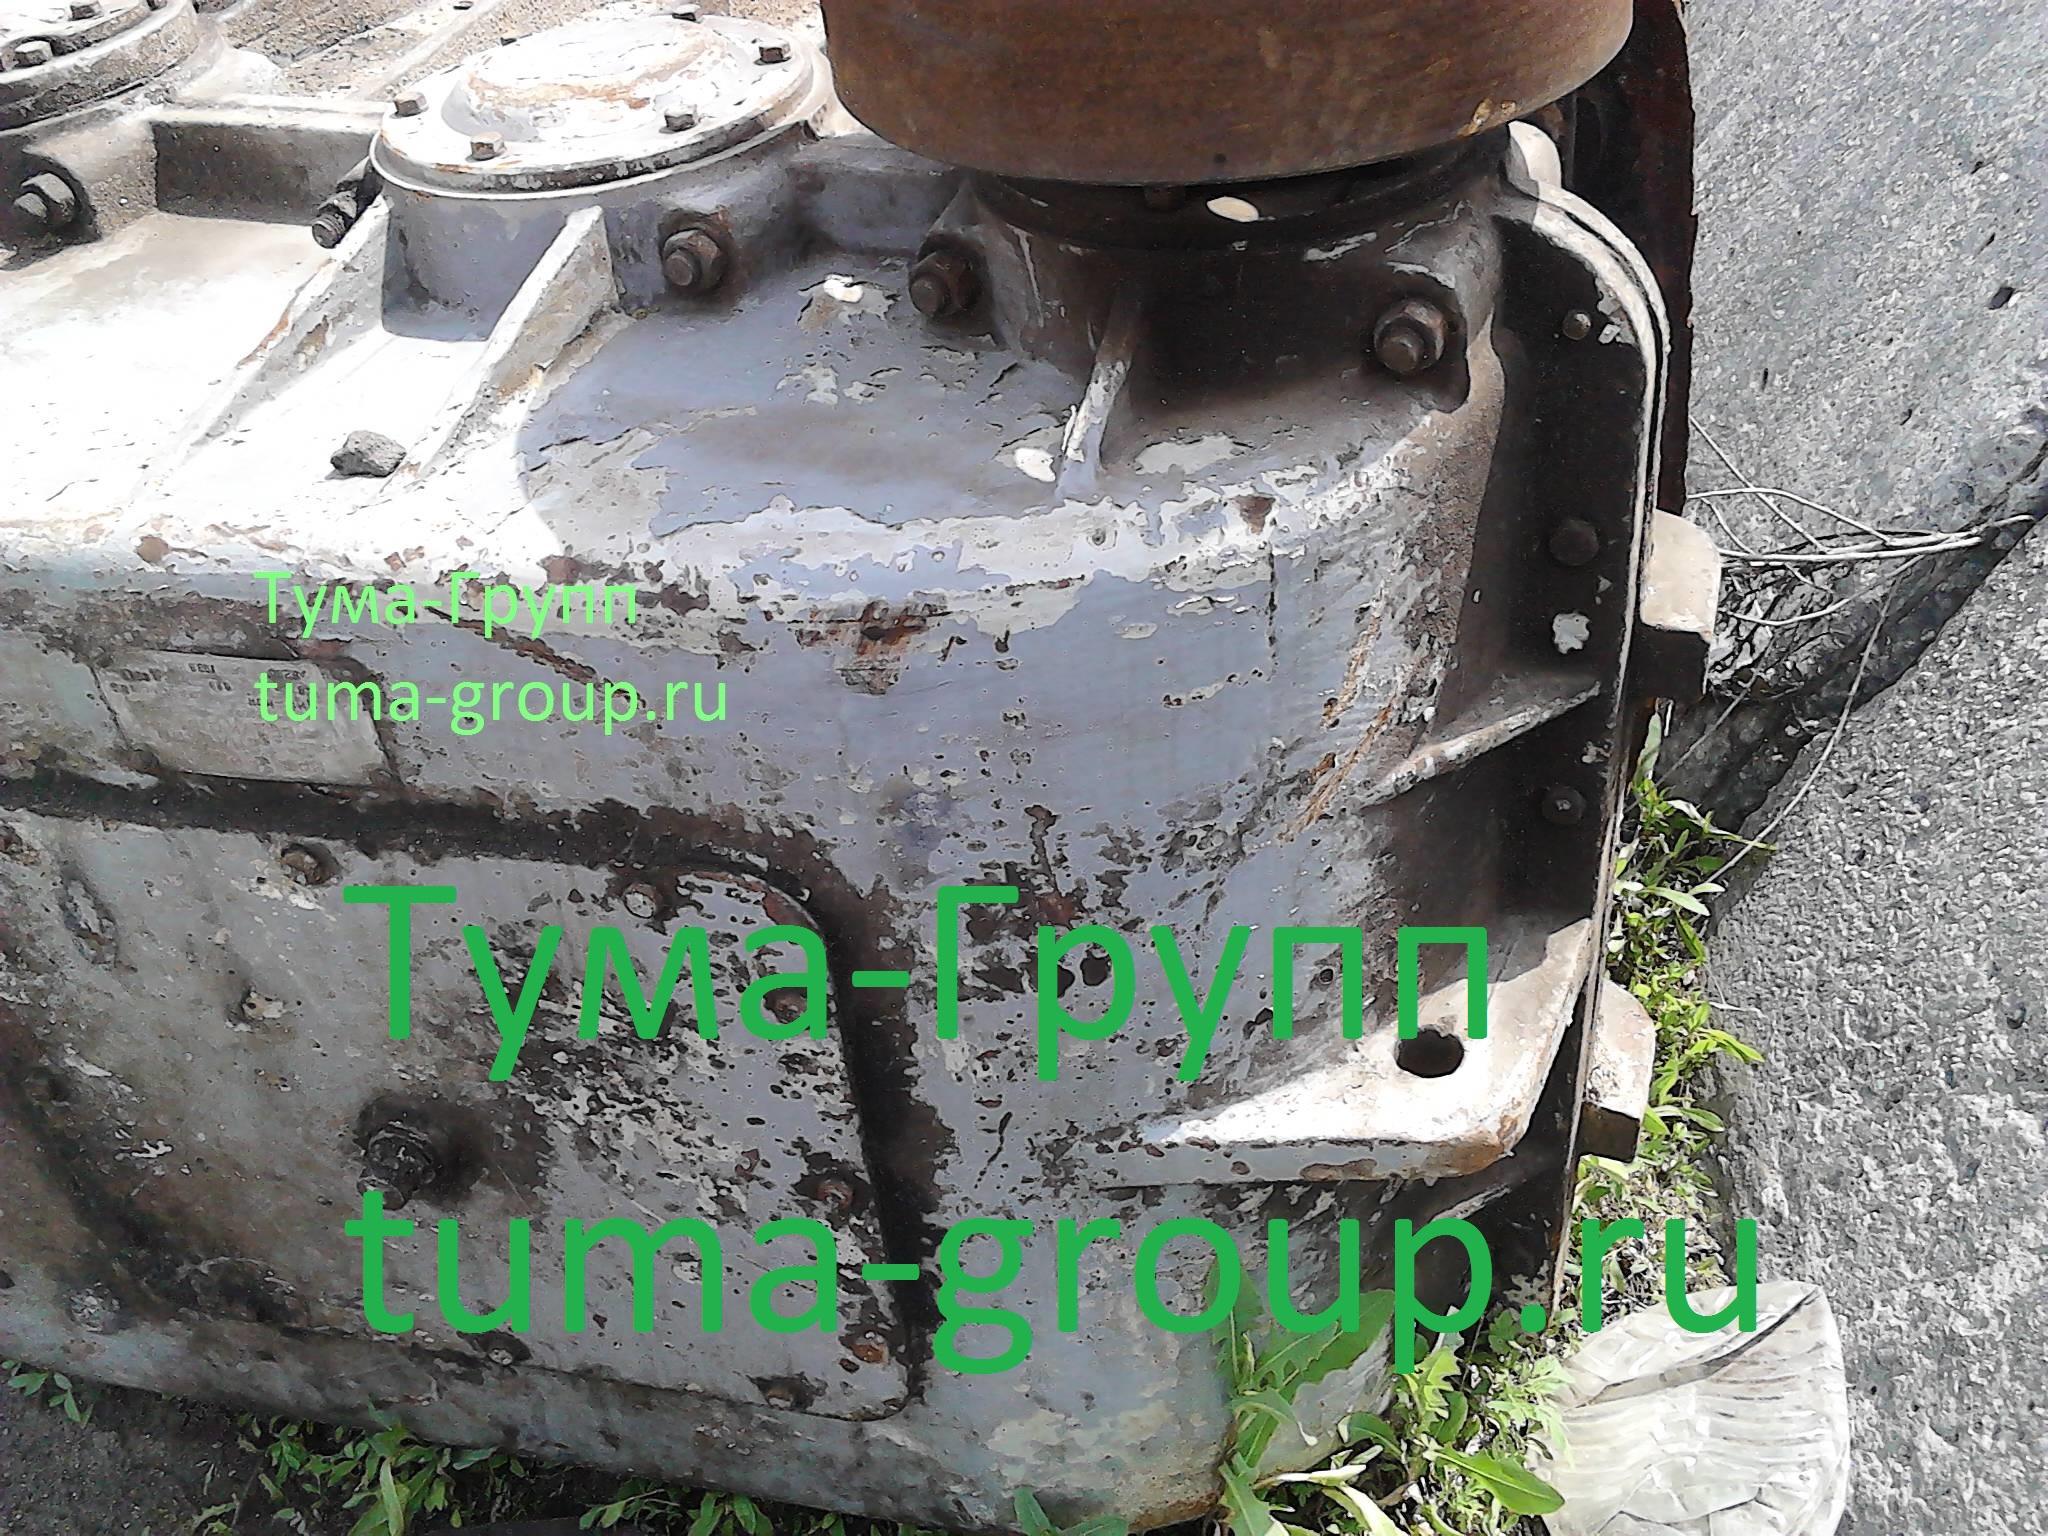 Продаем редуктор поворота на плавкран КПЛ 16-30.